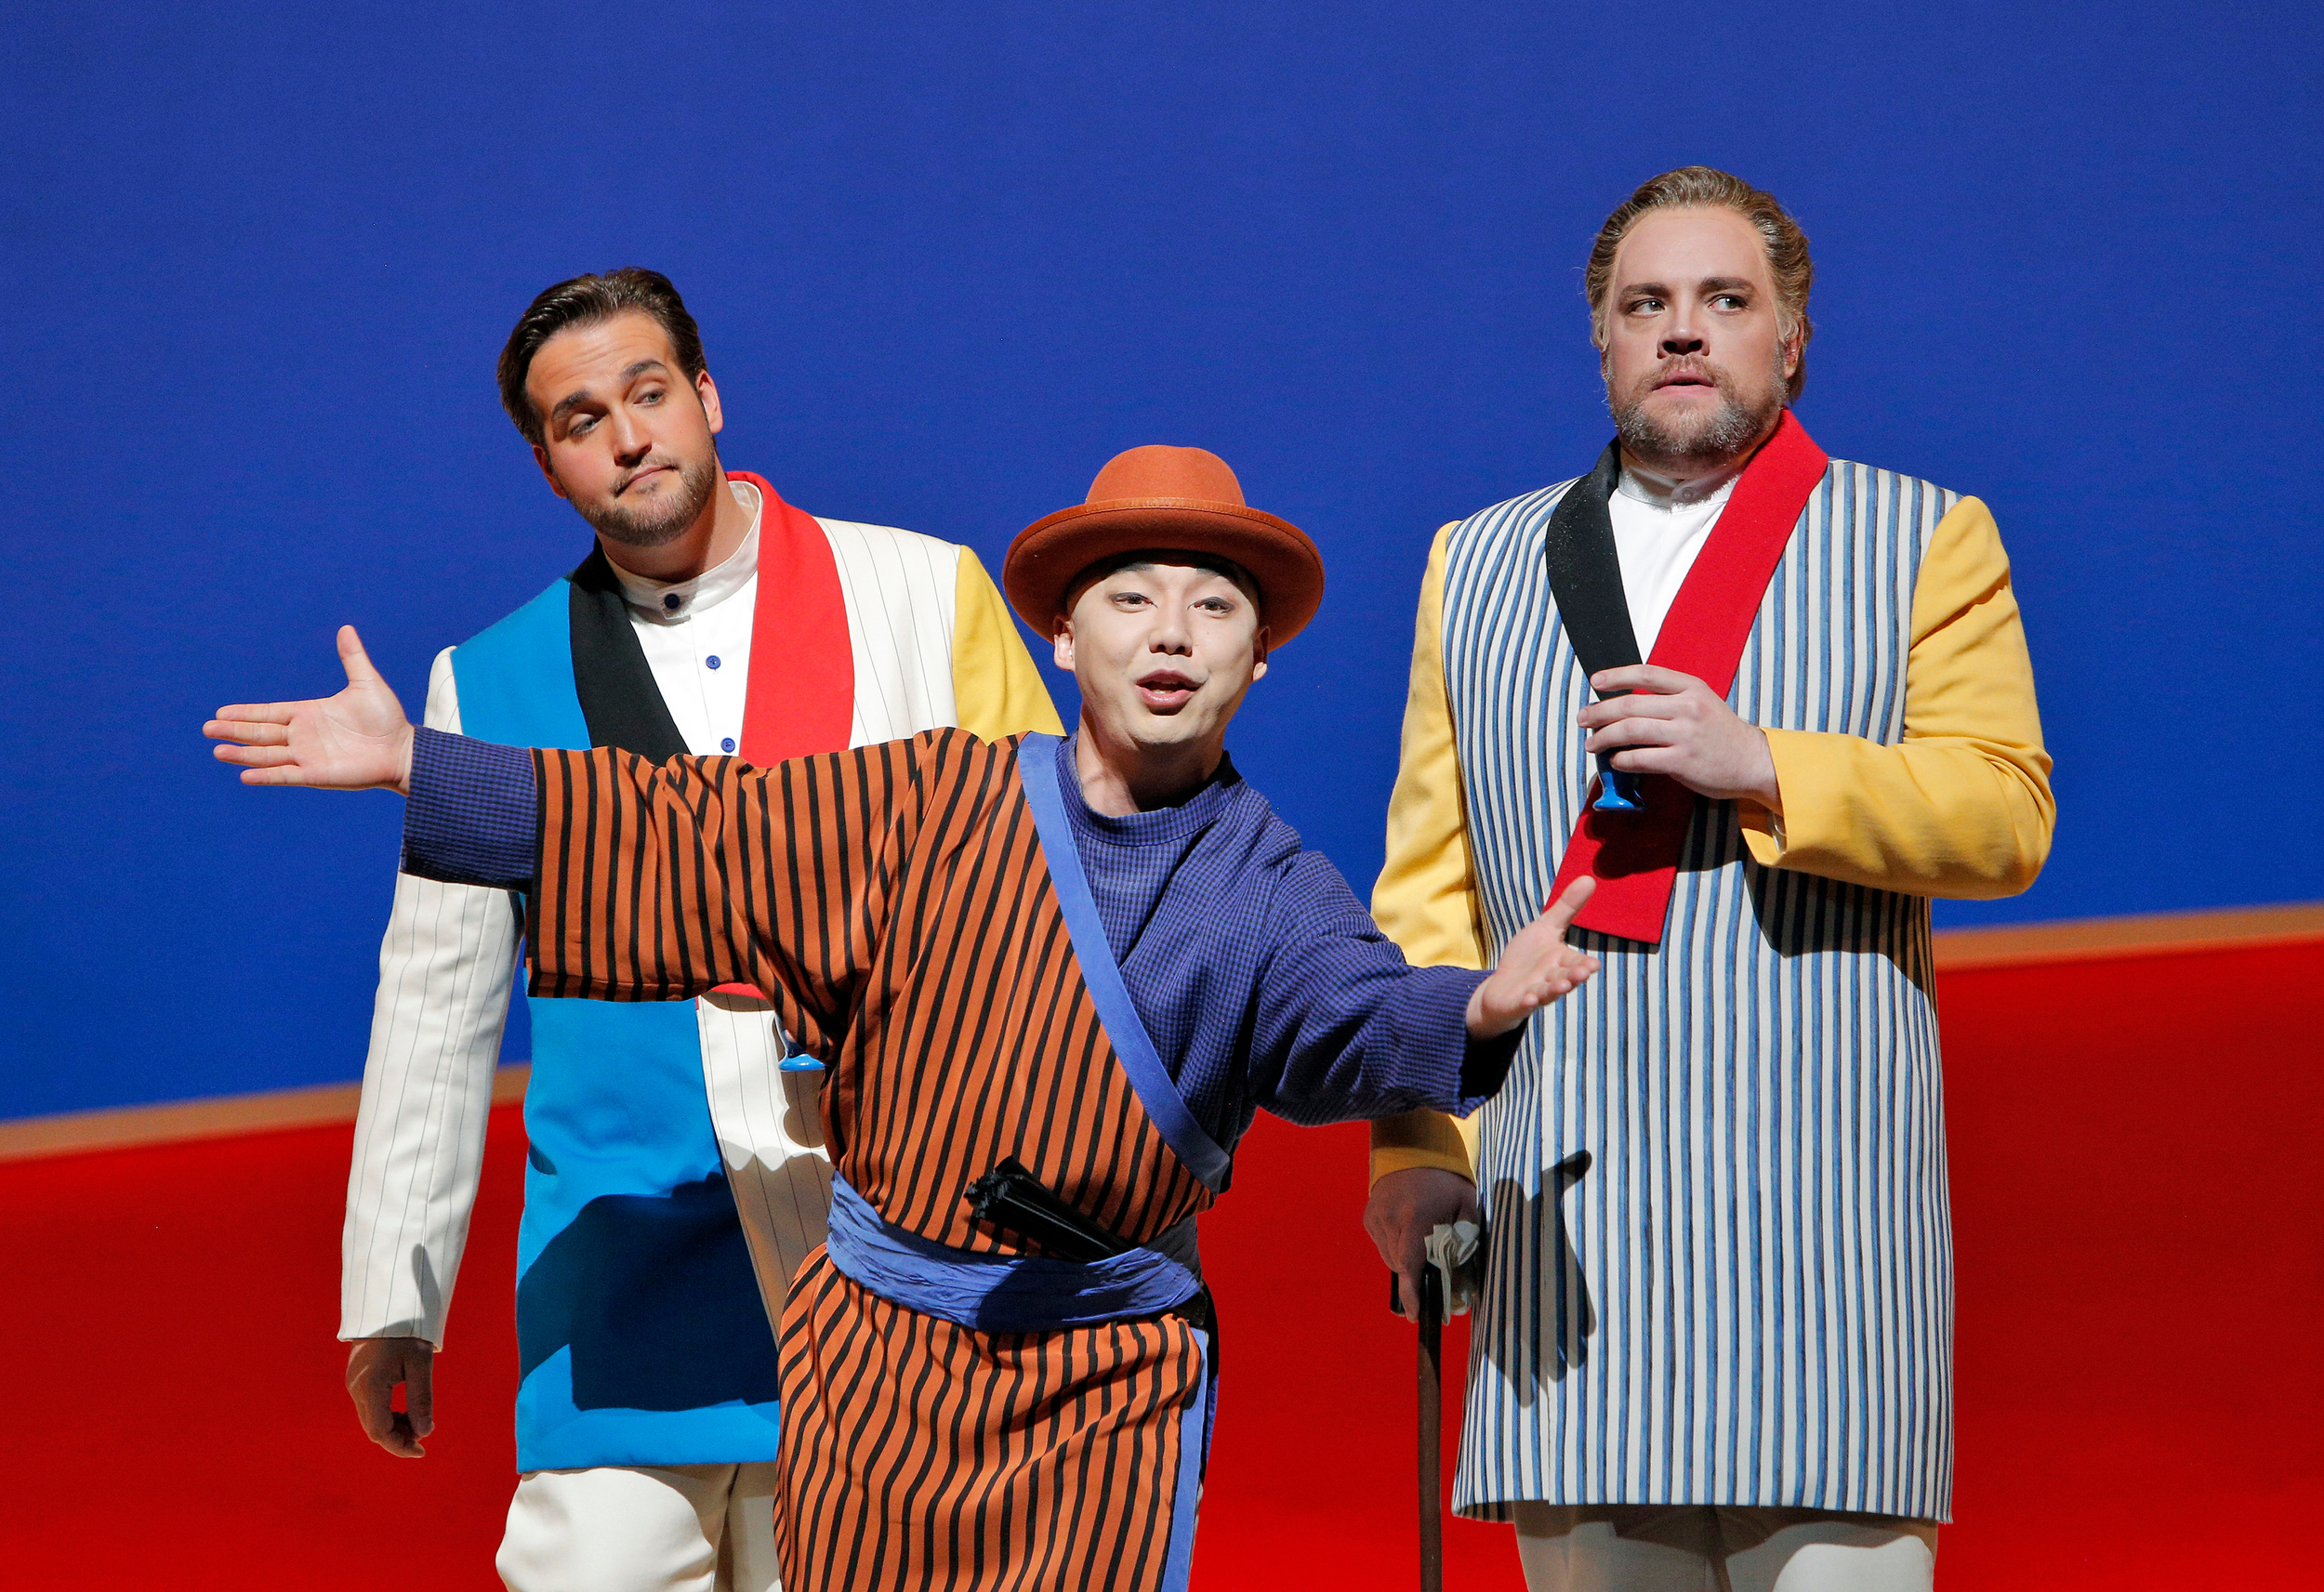 Goro  MADAMA BUTTERFLY  by Puccini San Francisco Opera Jun Kaneko Production  June 2014